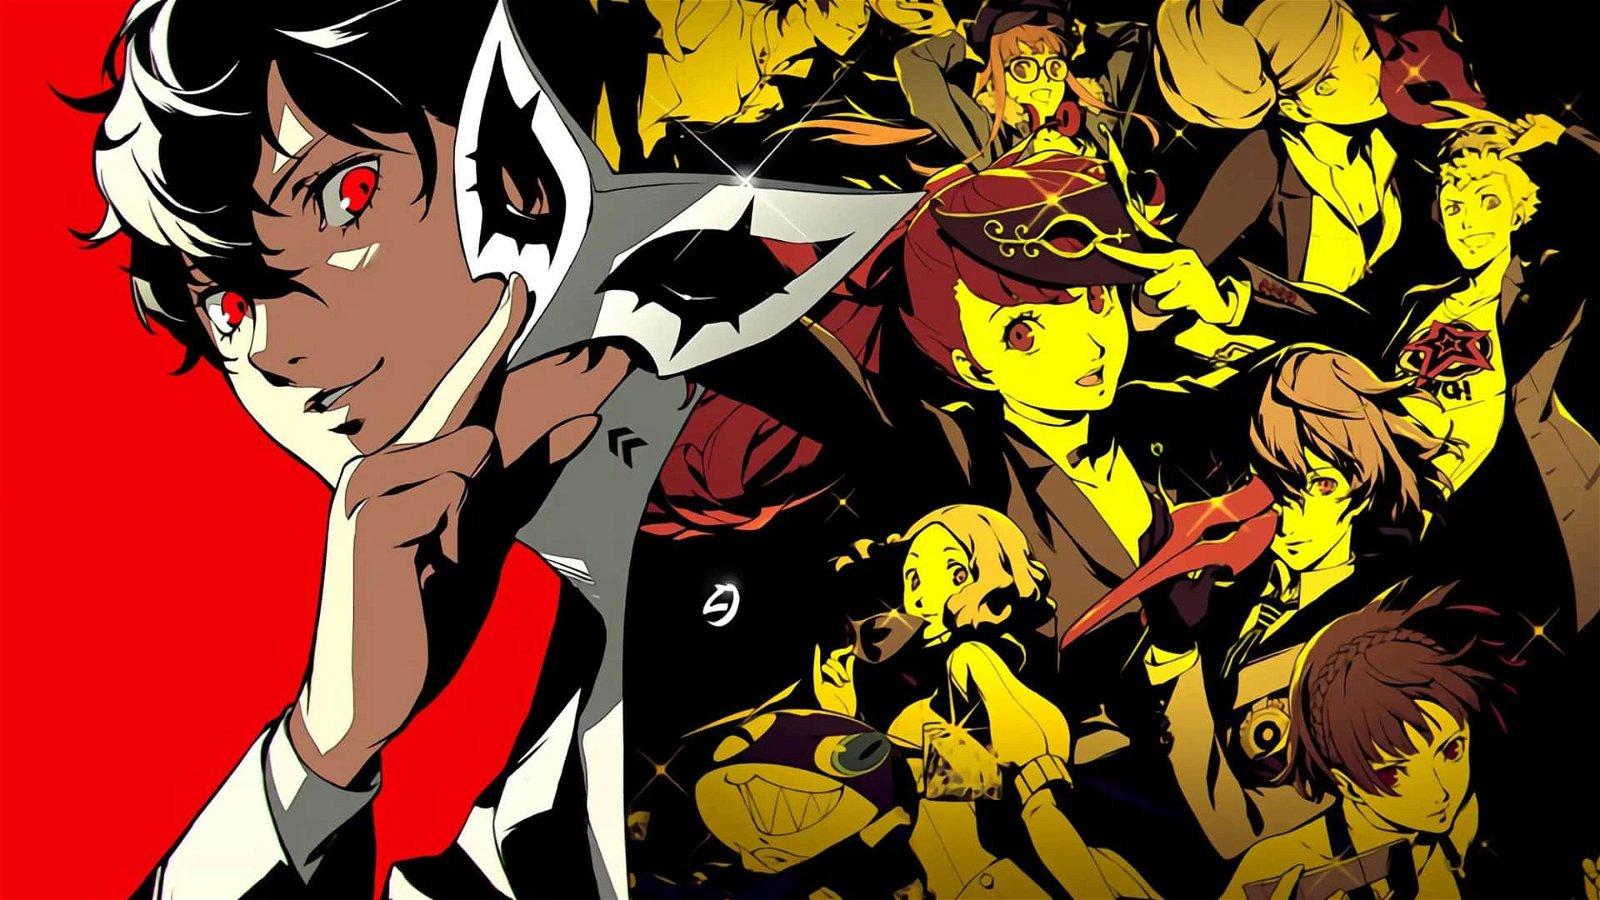 Persona Series Passes 15 Million Copies Sold Worldwide